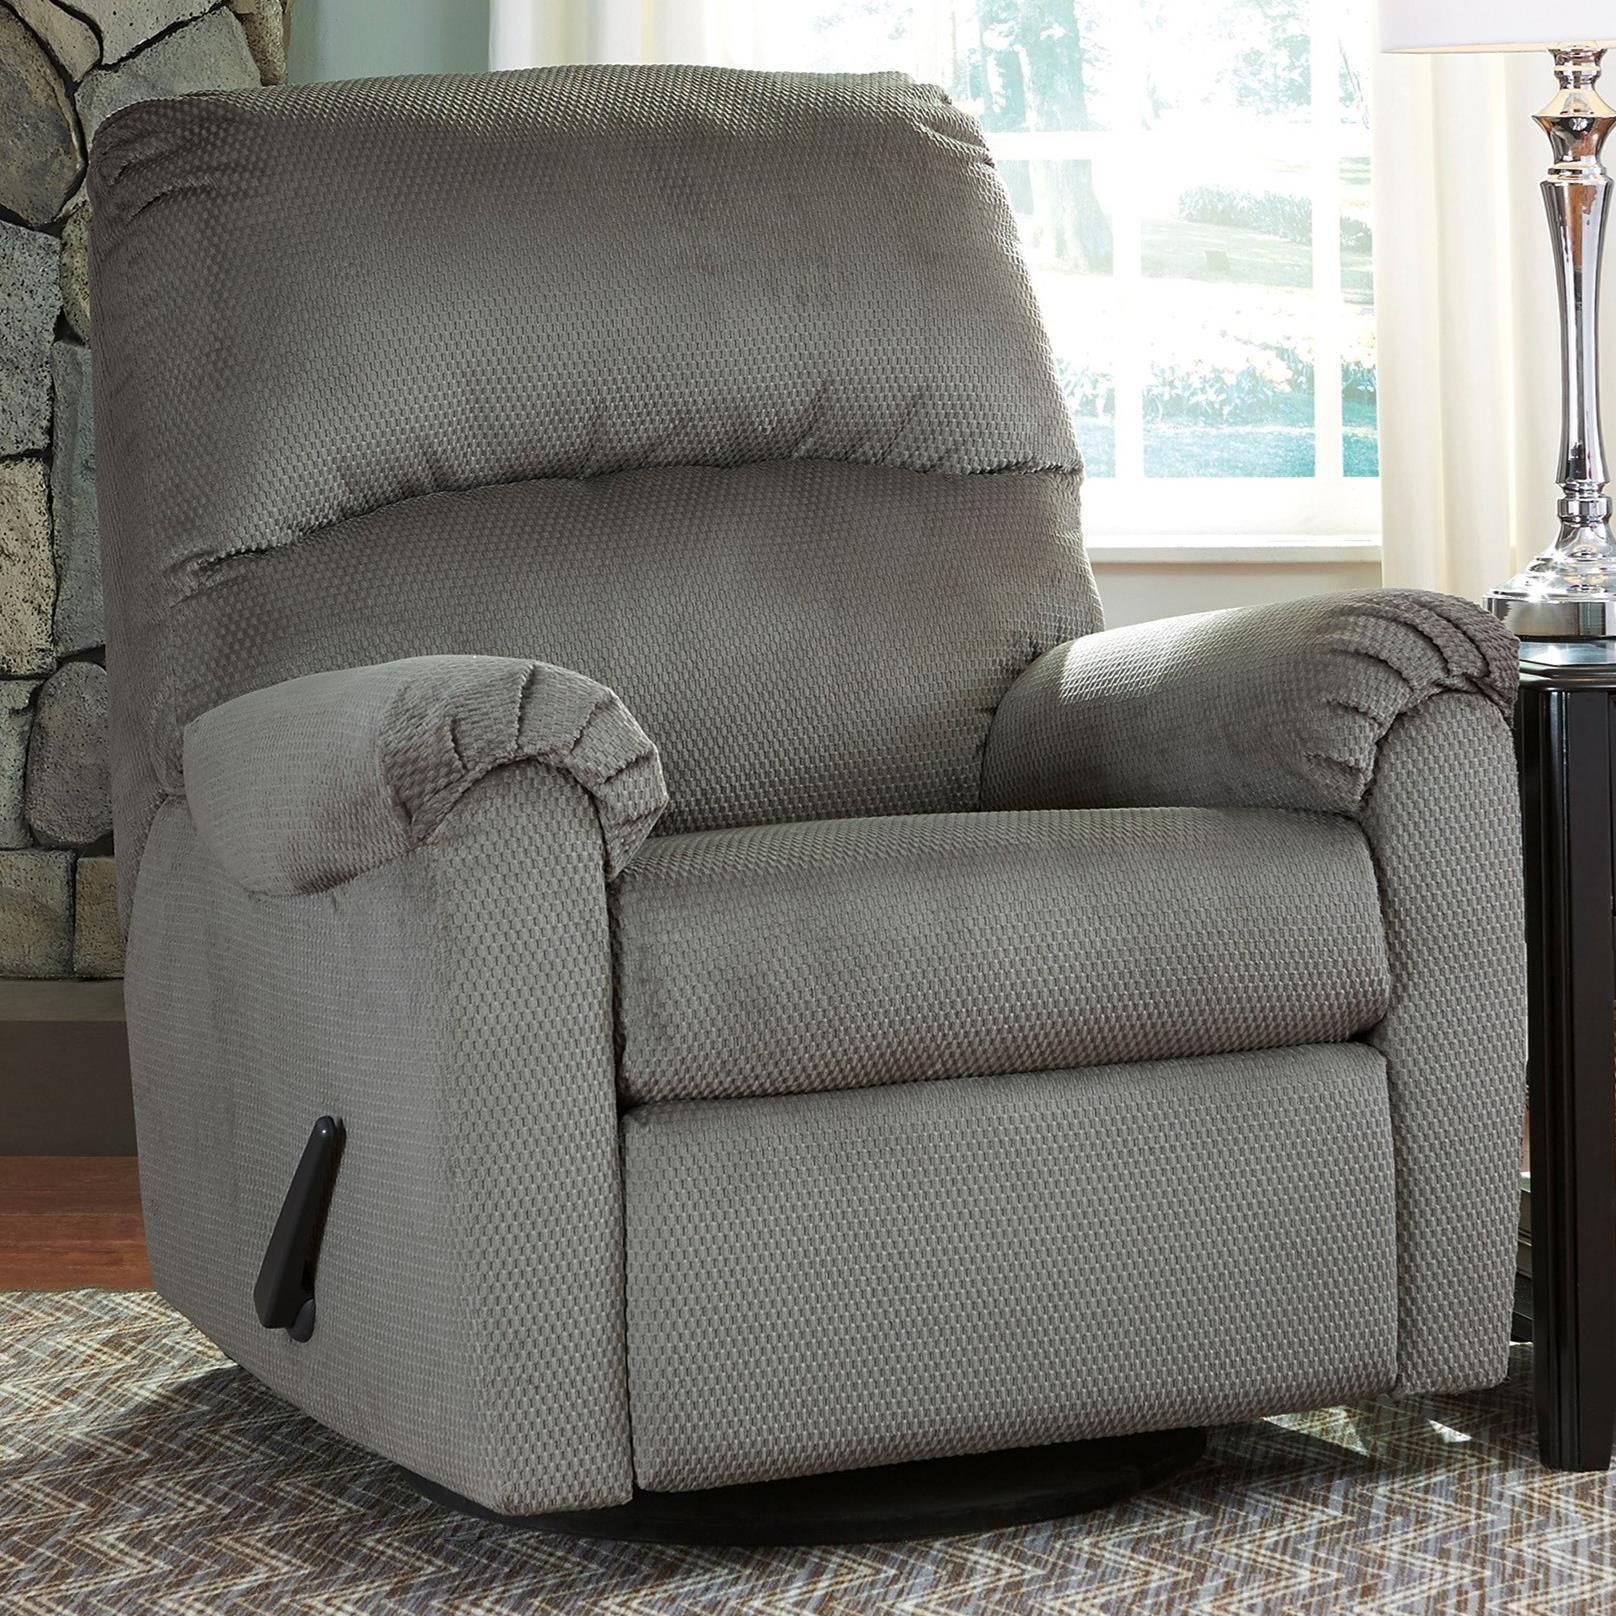 swivel rocker recliner signature design by ashley bronwyn swivel glider recliner with 360 degree YYVNPAC